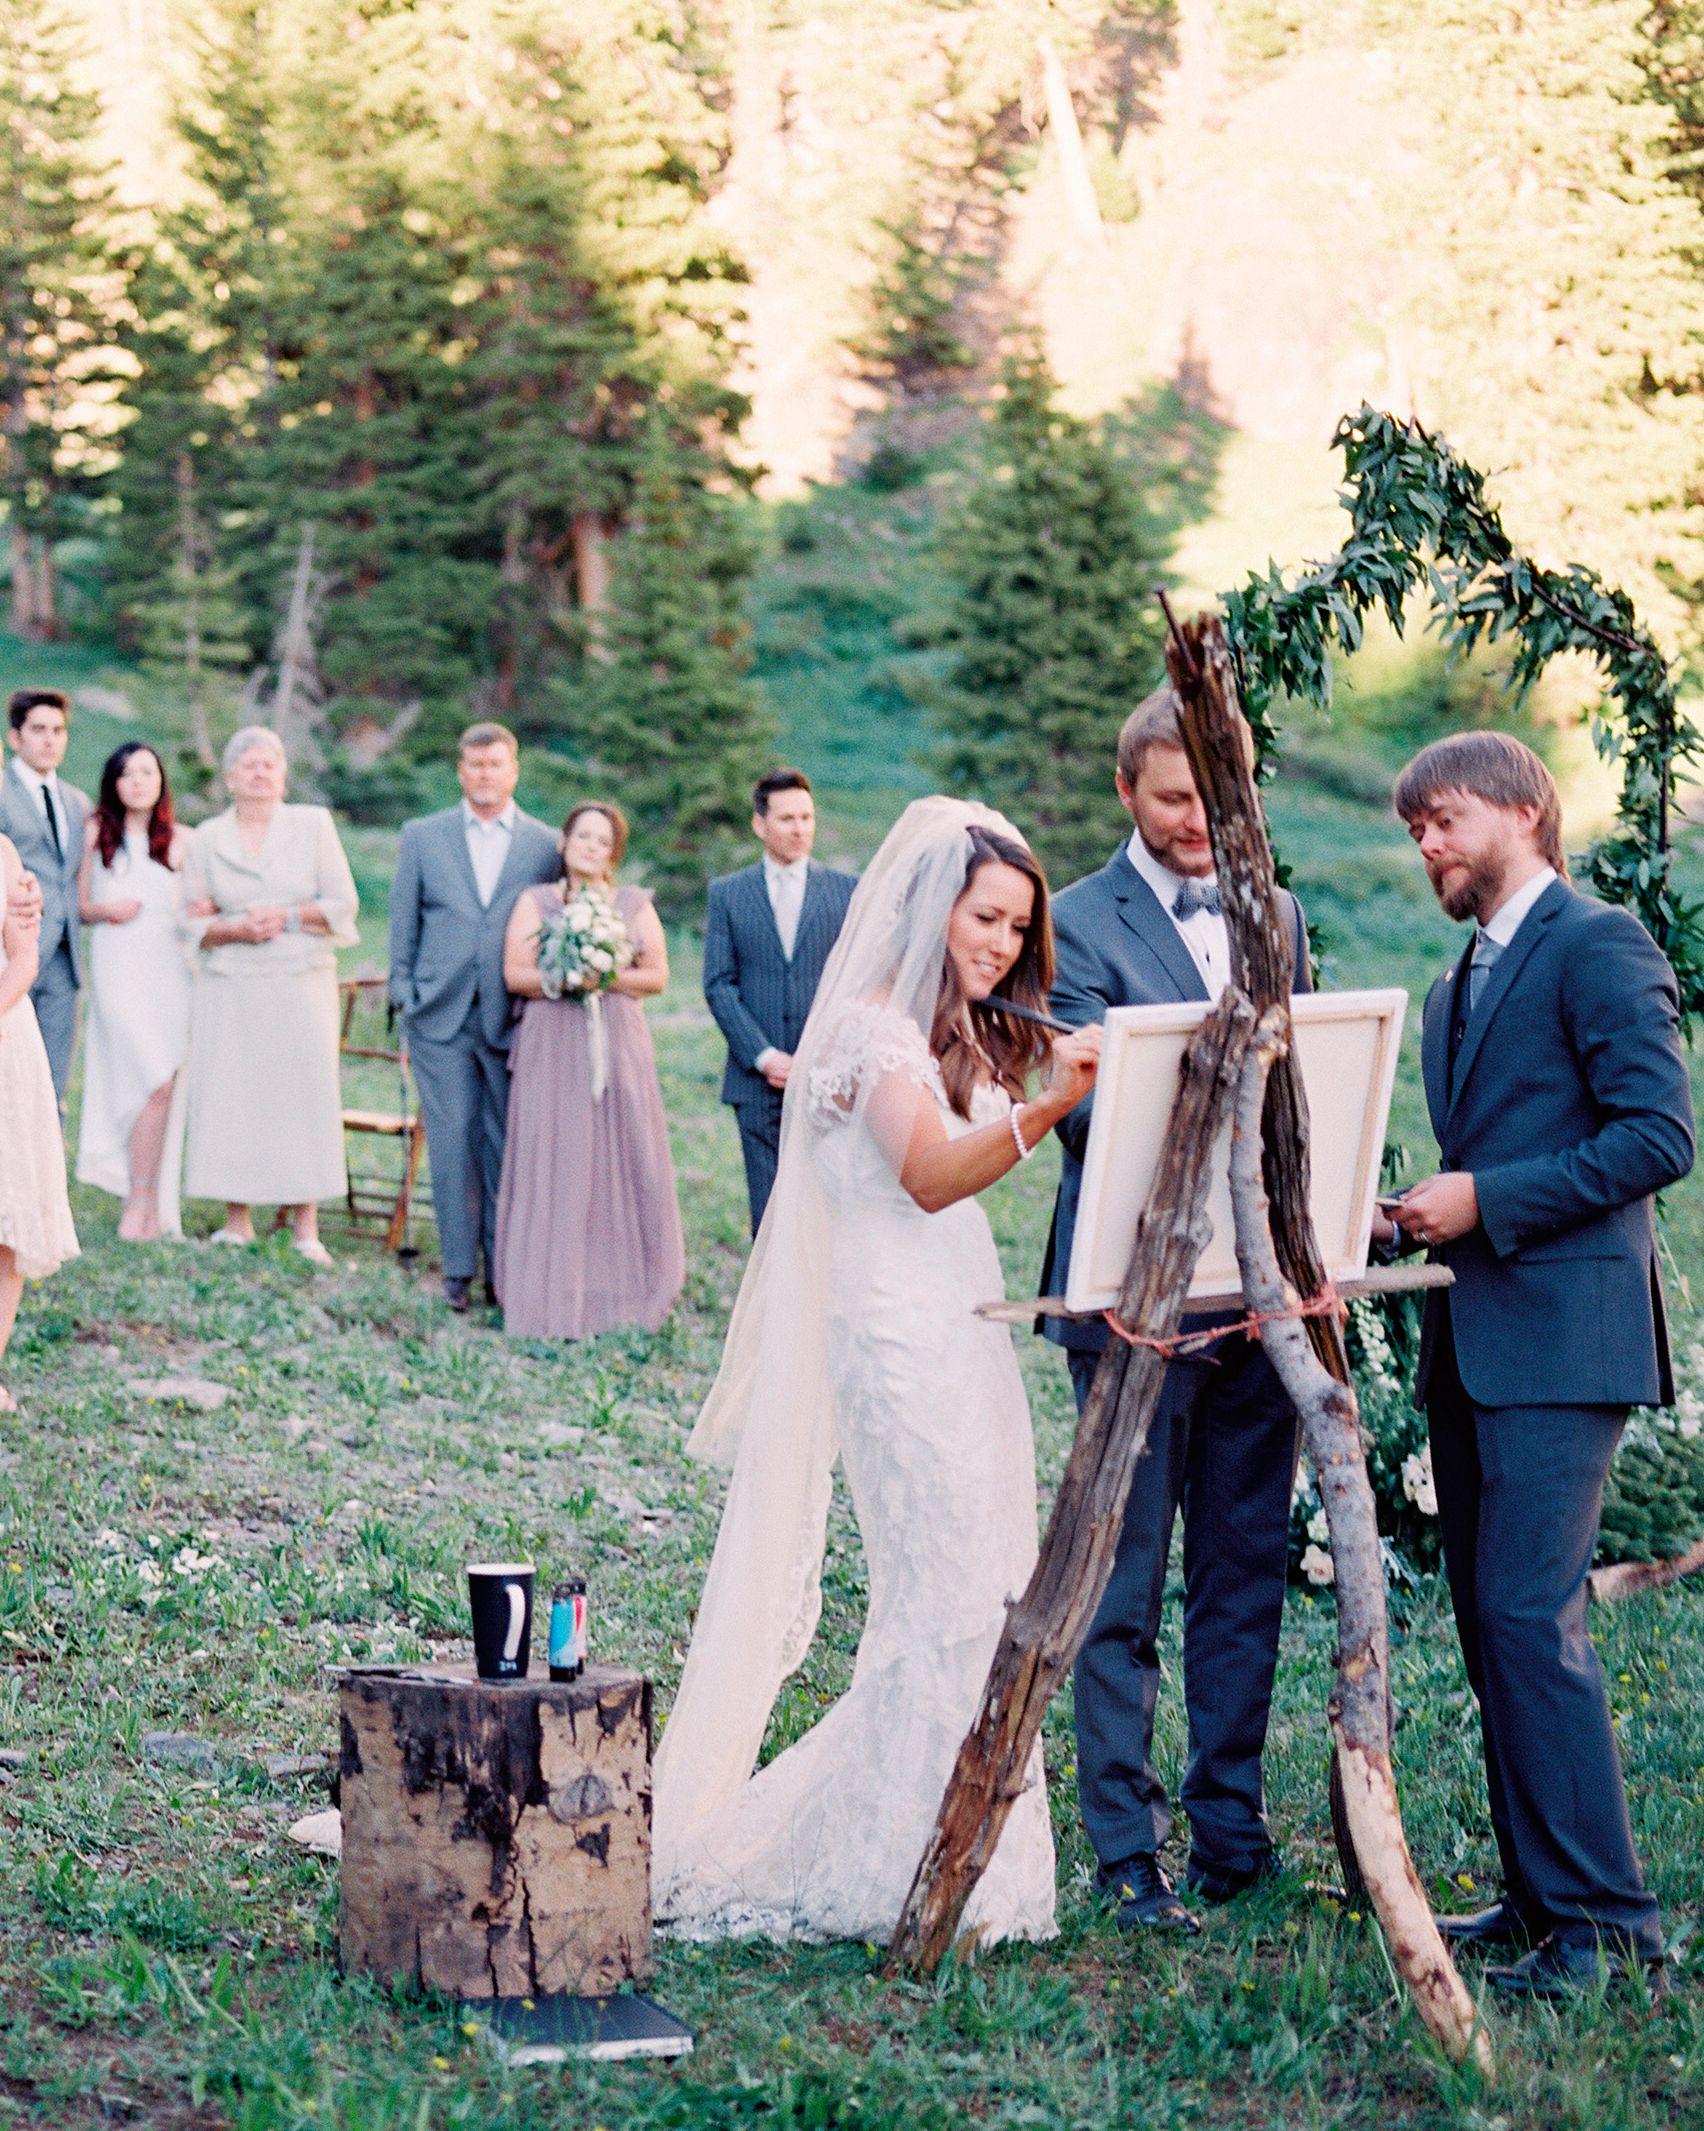 25 Creative Wedding Rituals That Symbolize Unity Christian Wedding Ceremony Wedding Rituals Wedding Ceremony Unity